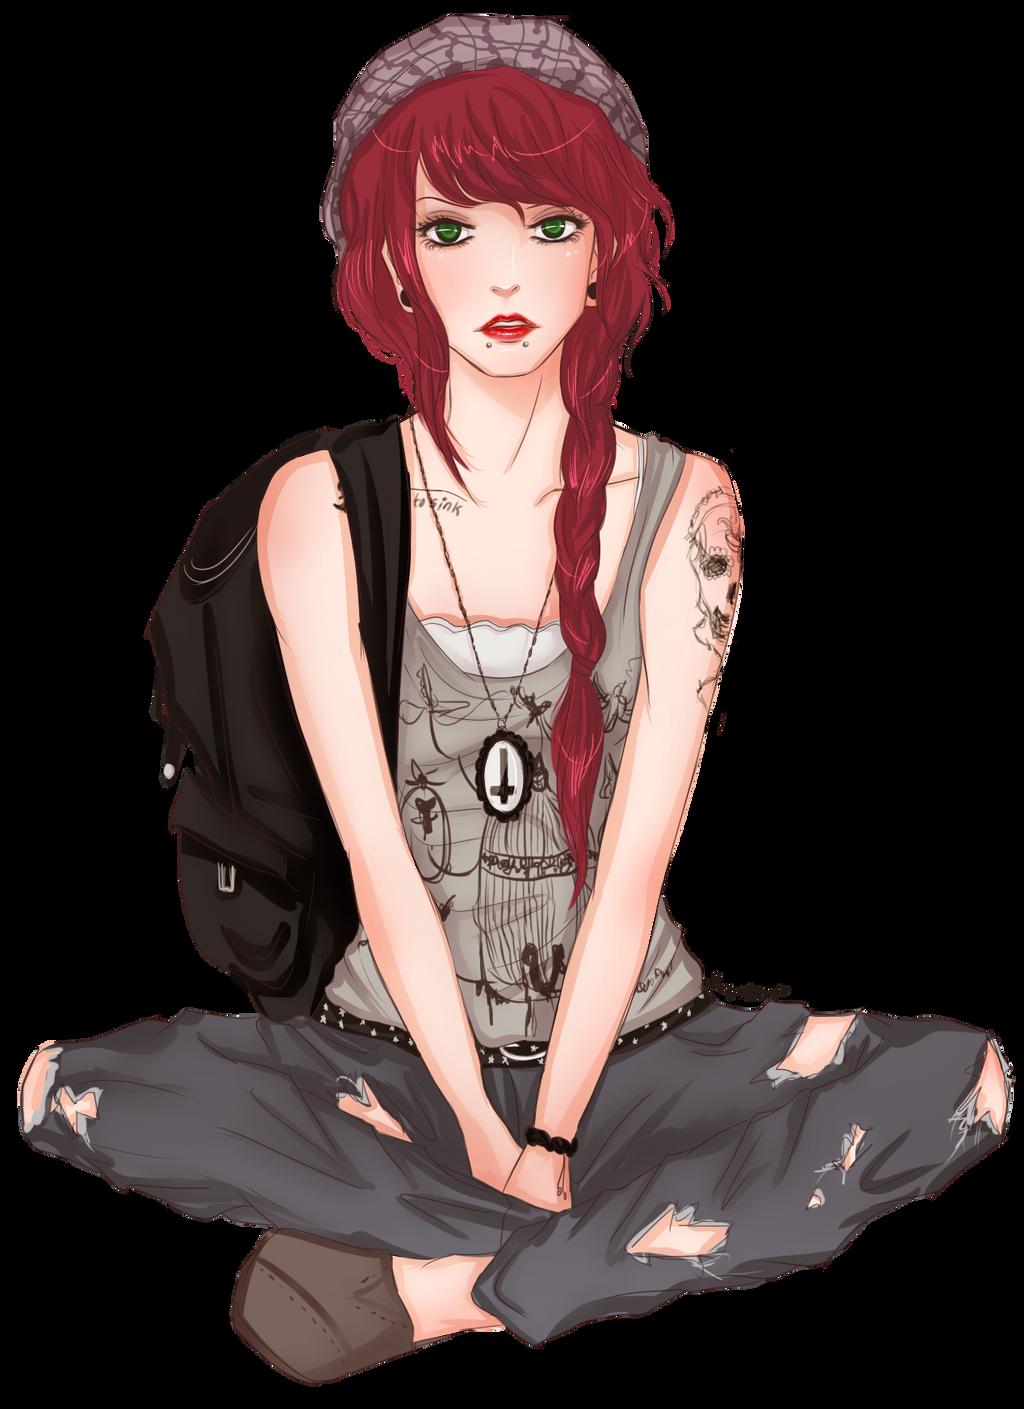 Anime Characters Full Body : Commission full body anime by lovelyartemis on deviantart